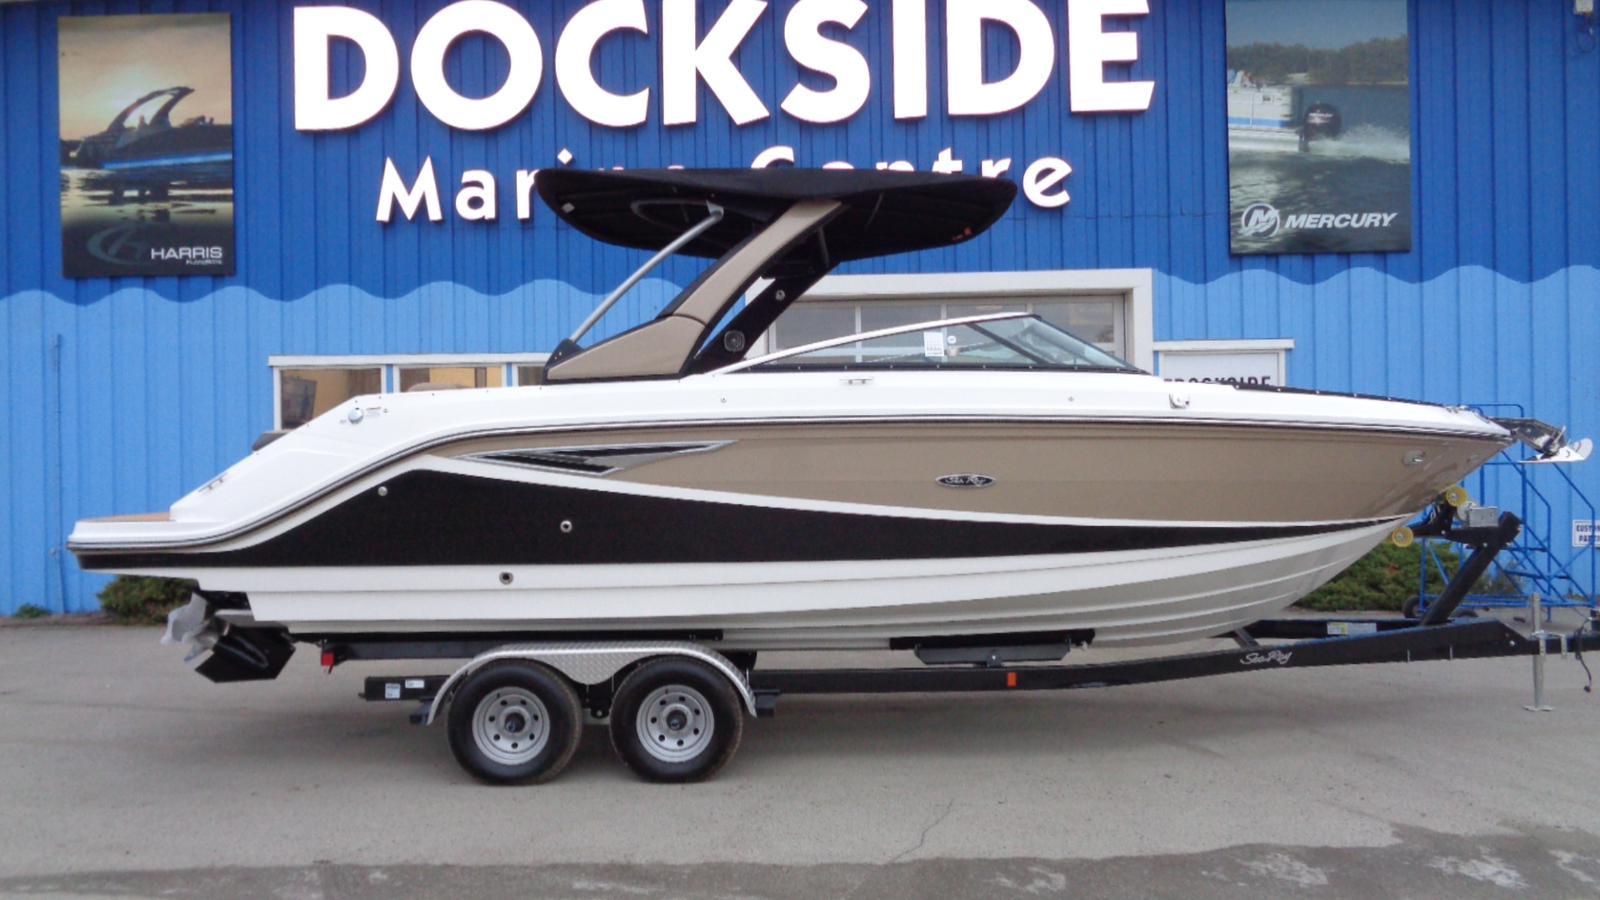 For Sale: 2018 Sea Ray Slx 280 29ft<br/>Dockside Marine Centre, LTD.